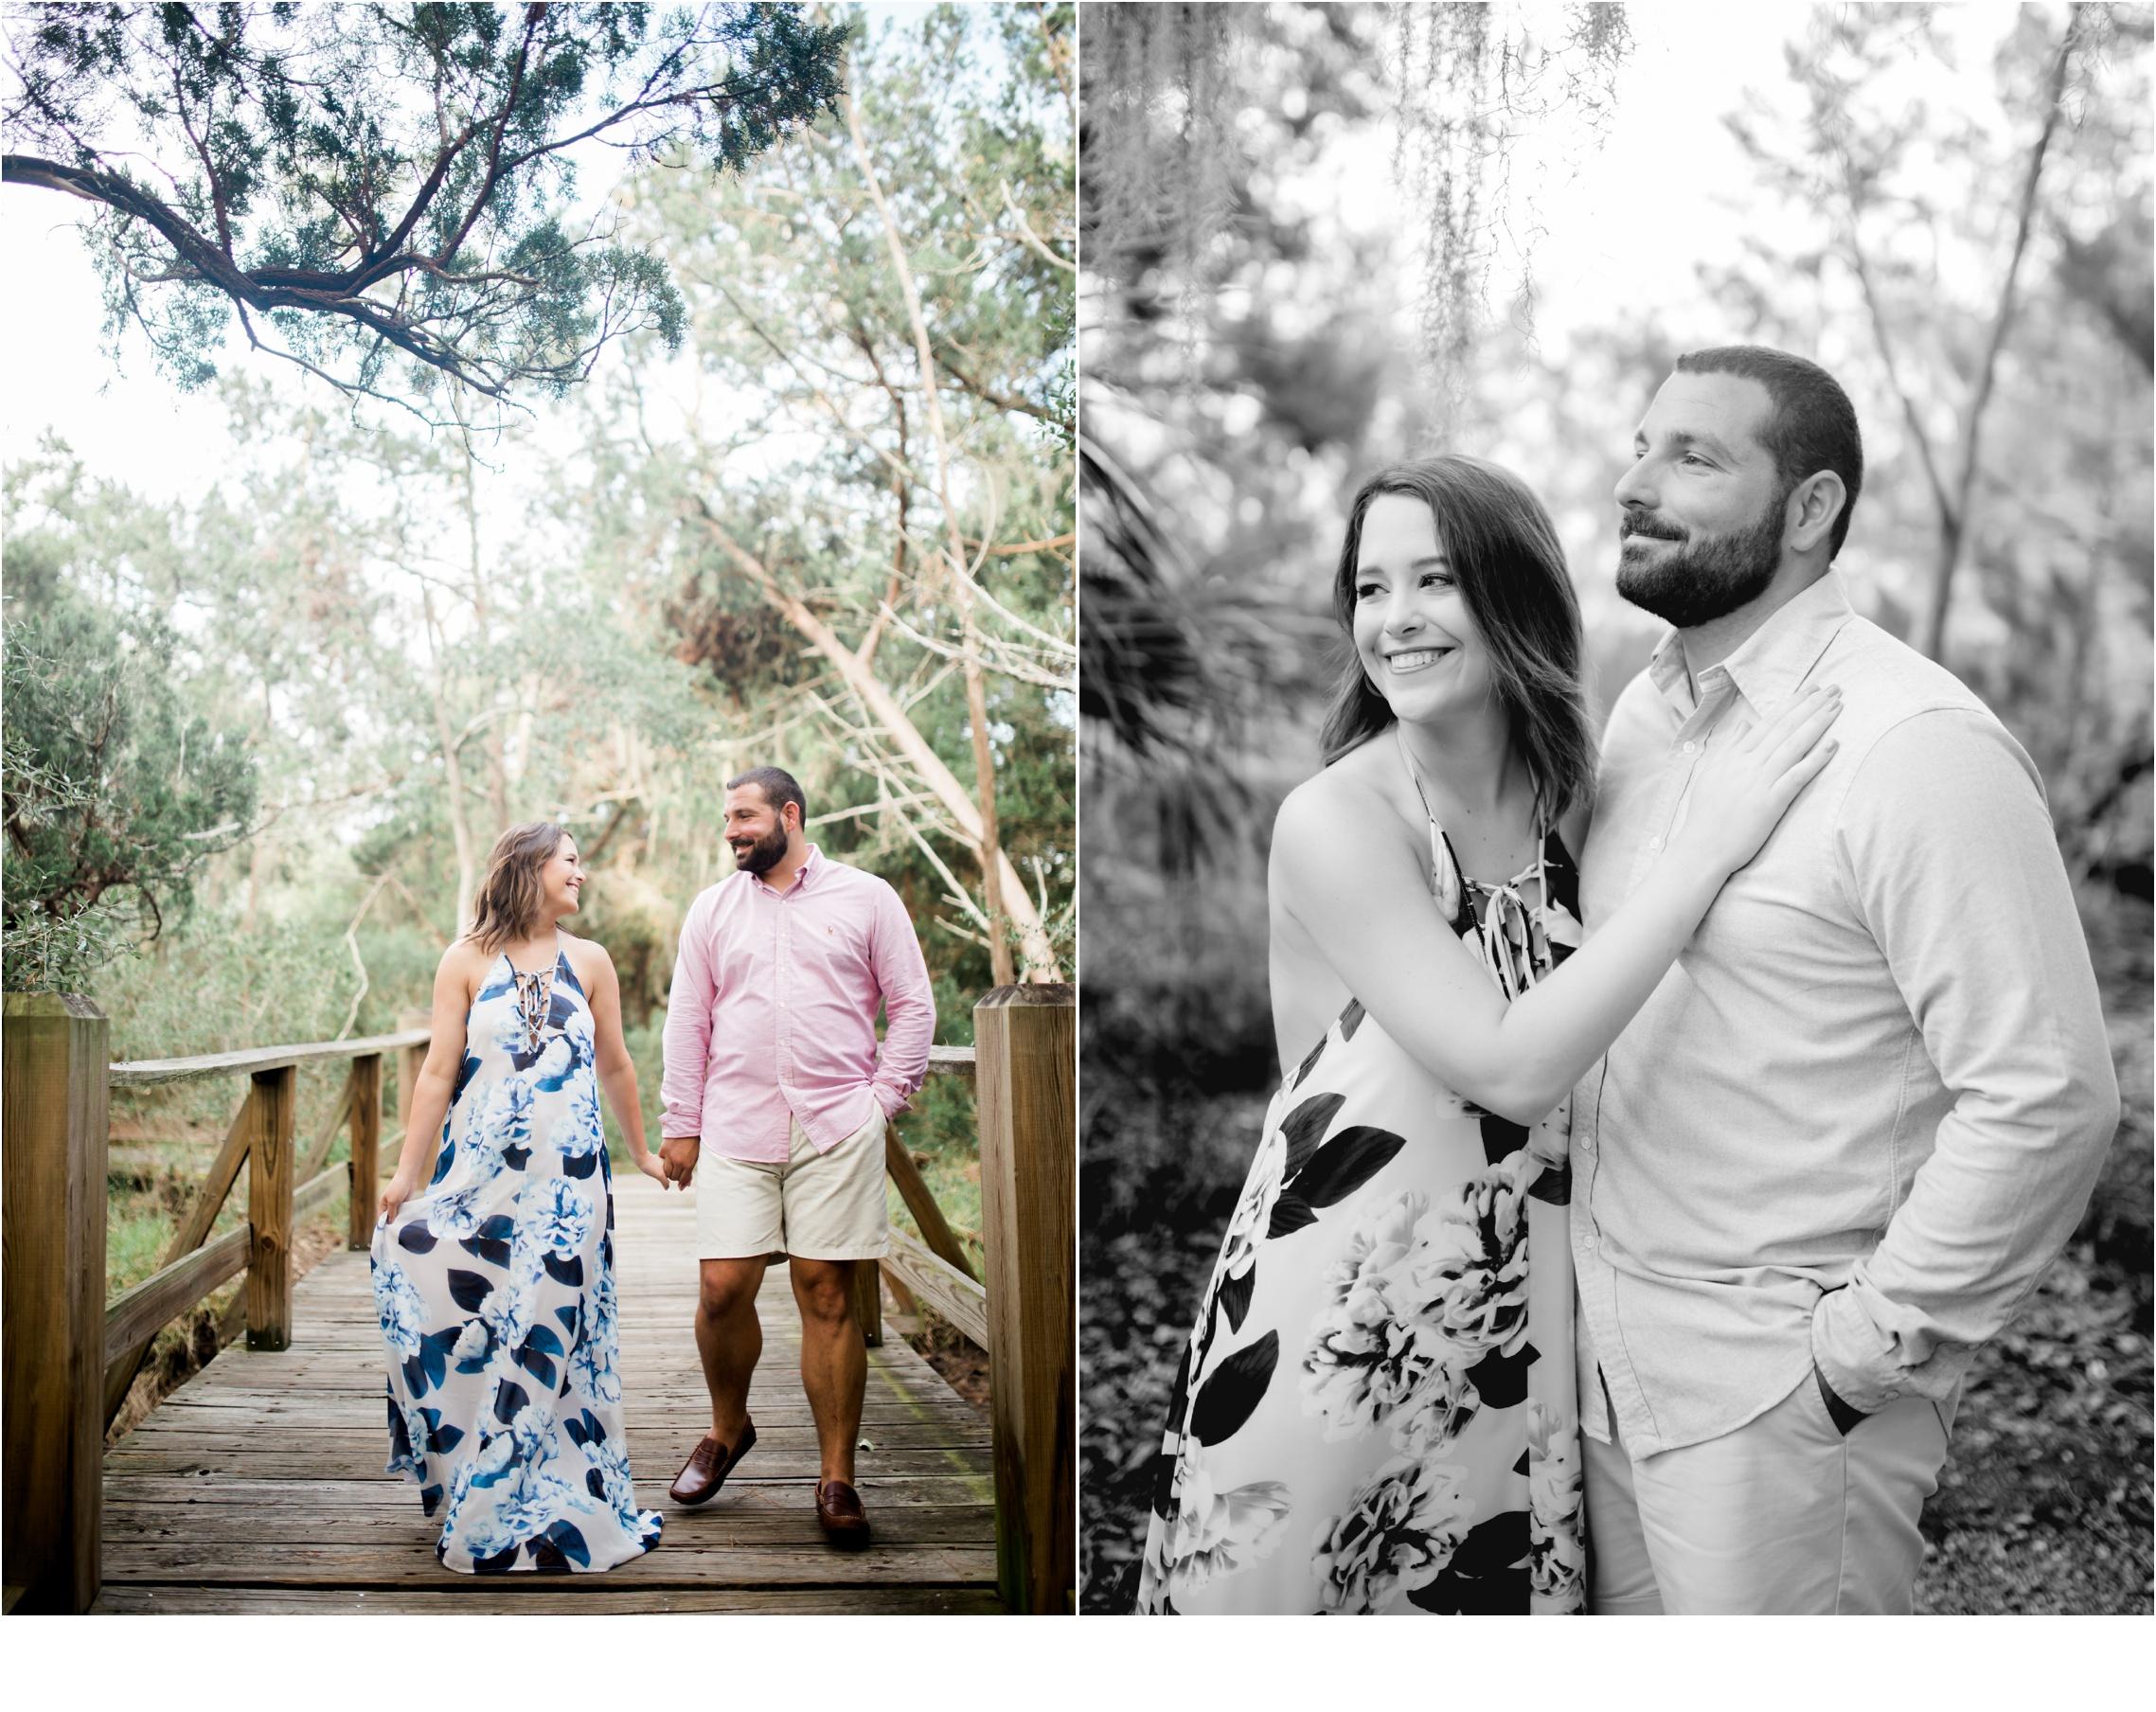 Rainey_Gregg_Photography_St._Simons_Island_Georgia_California_Wedding_Portrait_Photography_0146.jpg